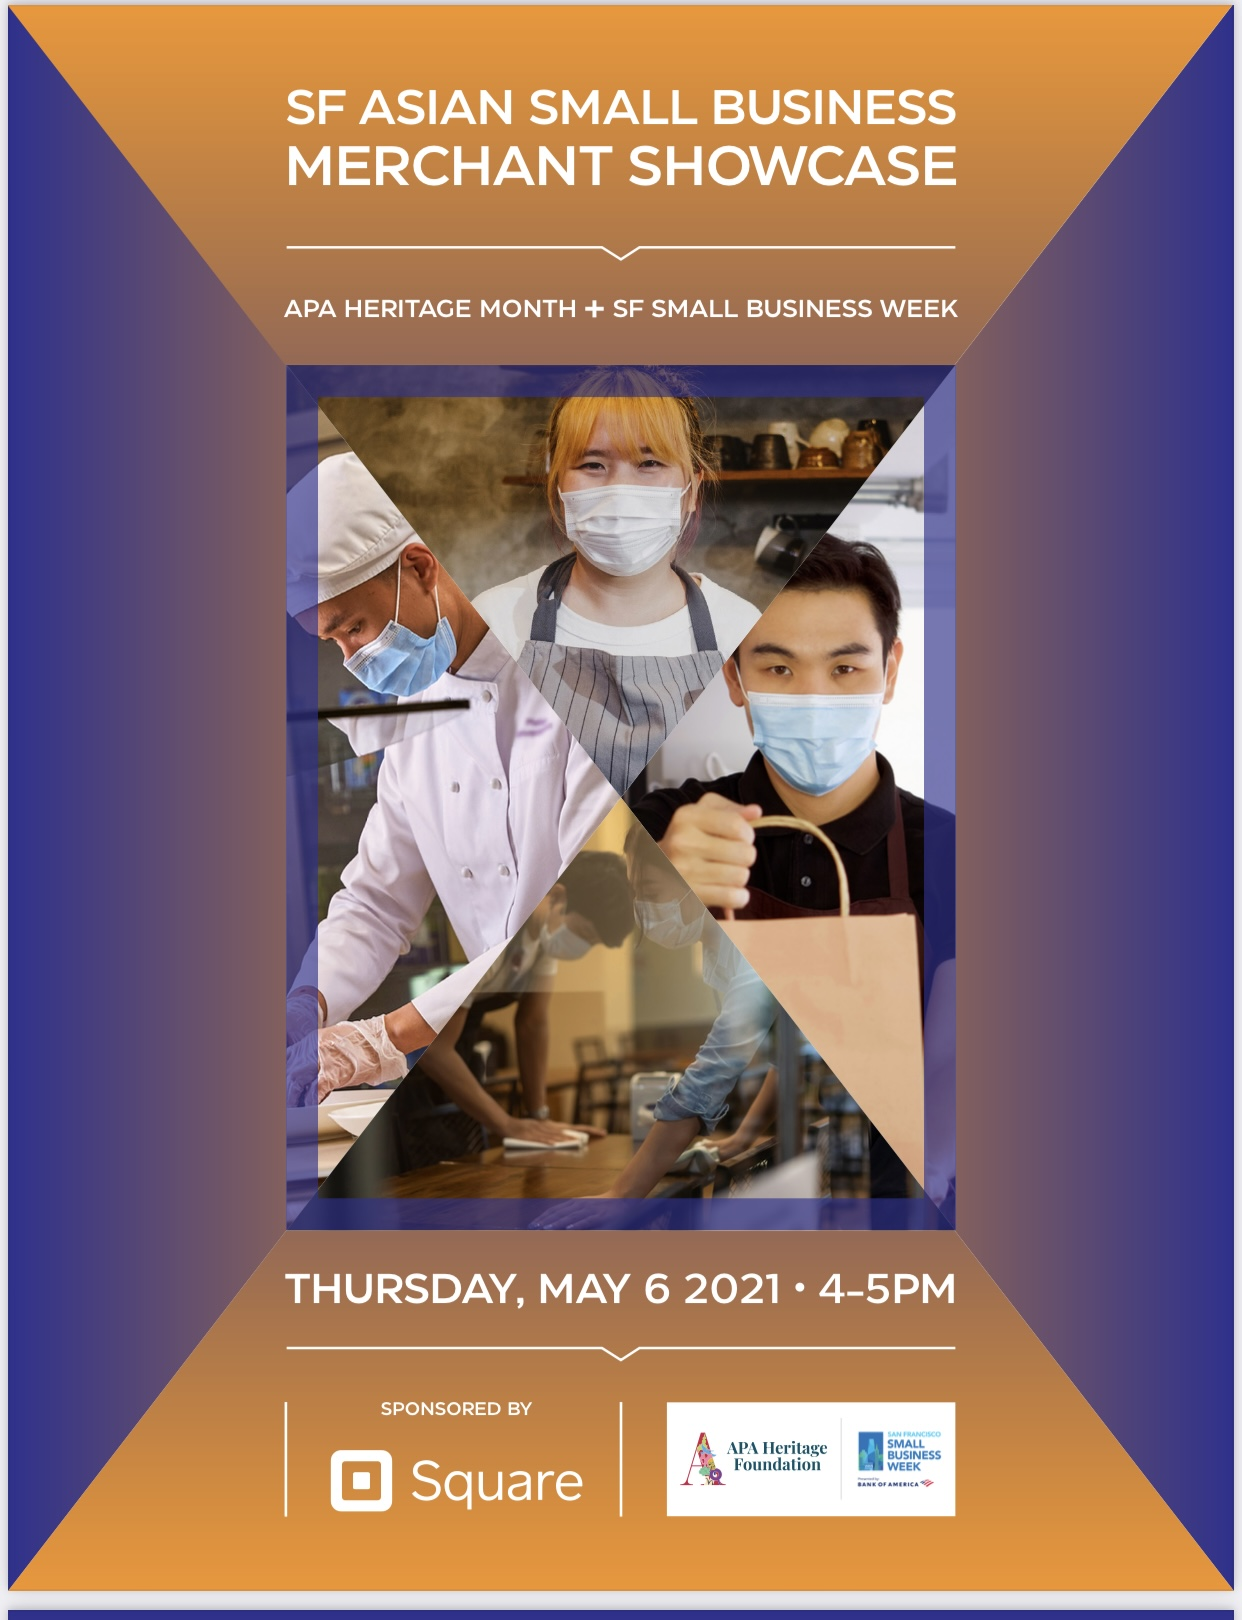 SF Asian Small Business Merchant Showcase